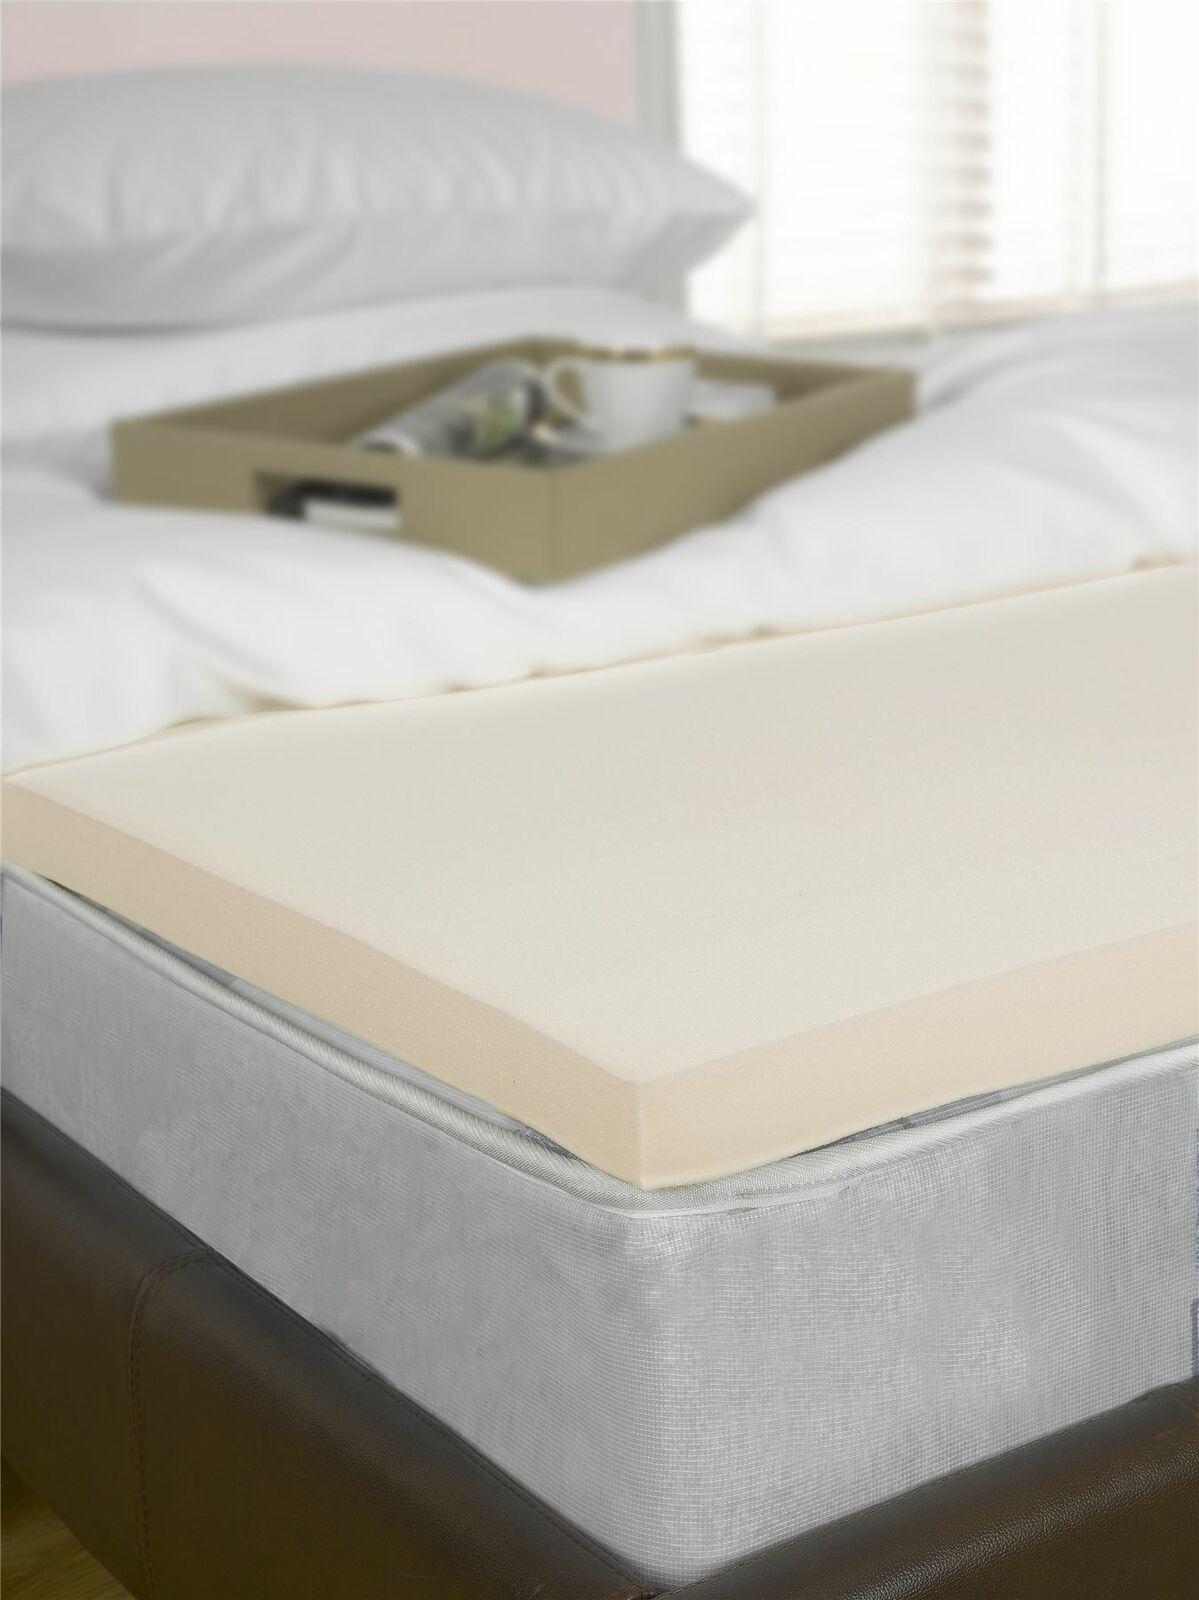 2  European King Bed Größe Memory Foam Mattress Topper Orthopaedic (160x200cm)